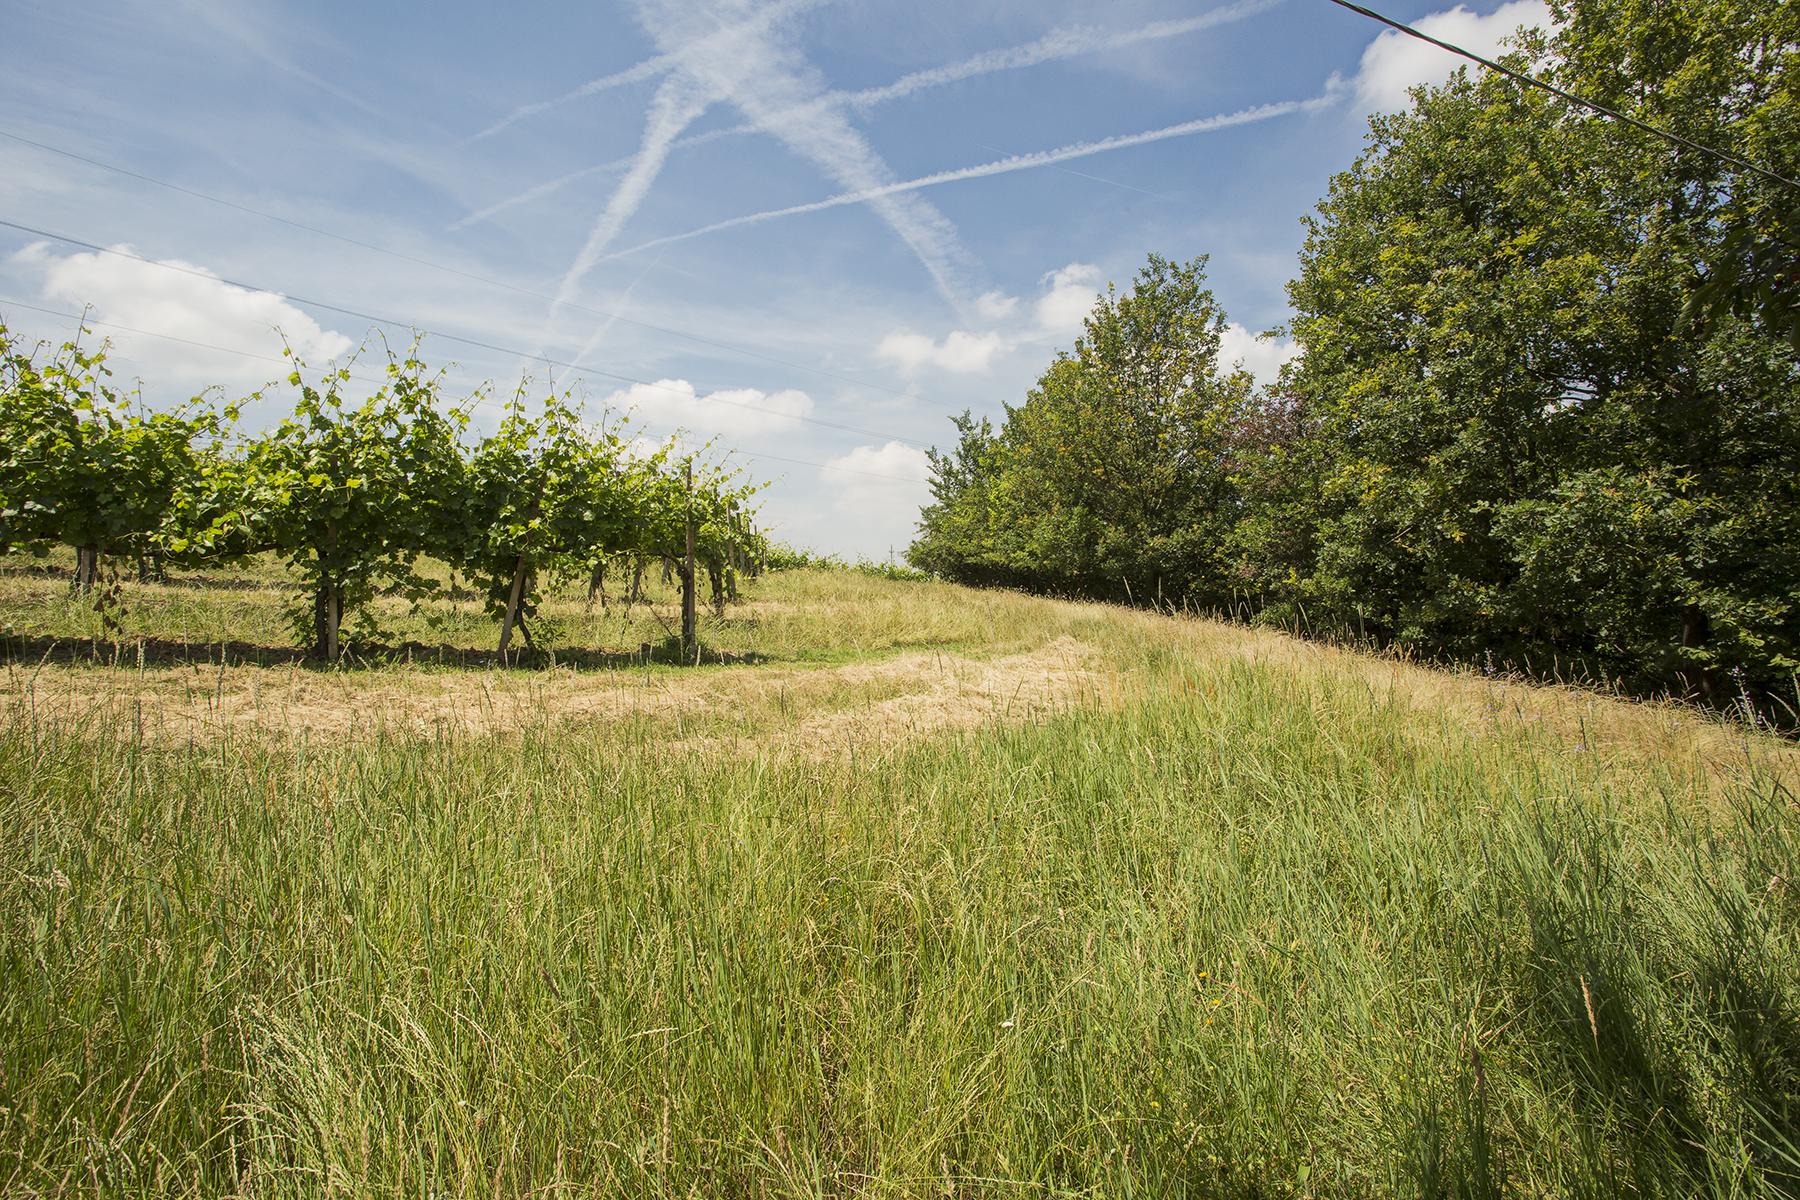 Rustico in Vendita a Novi Ligure: 5 locali, 300 mq - Foto 7